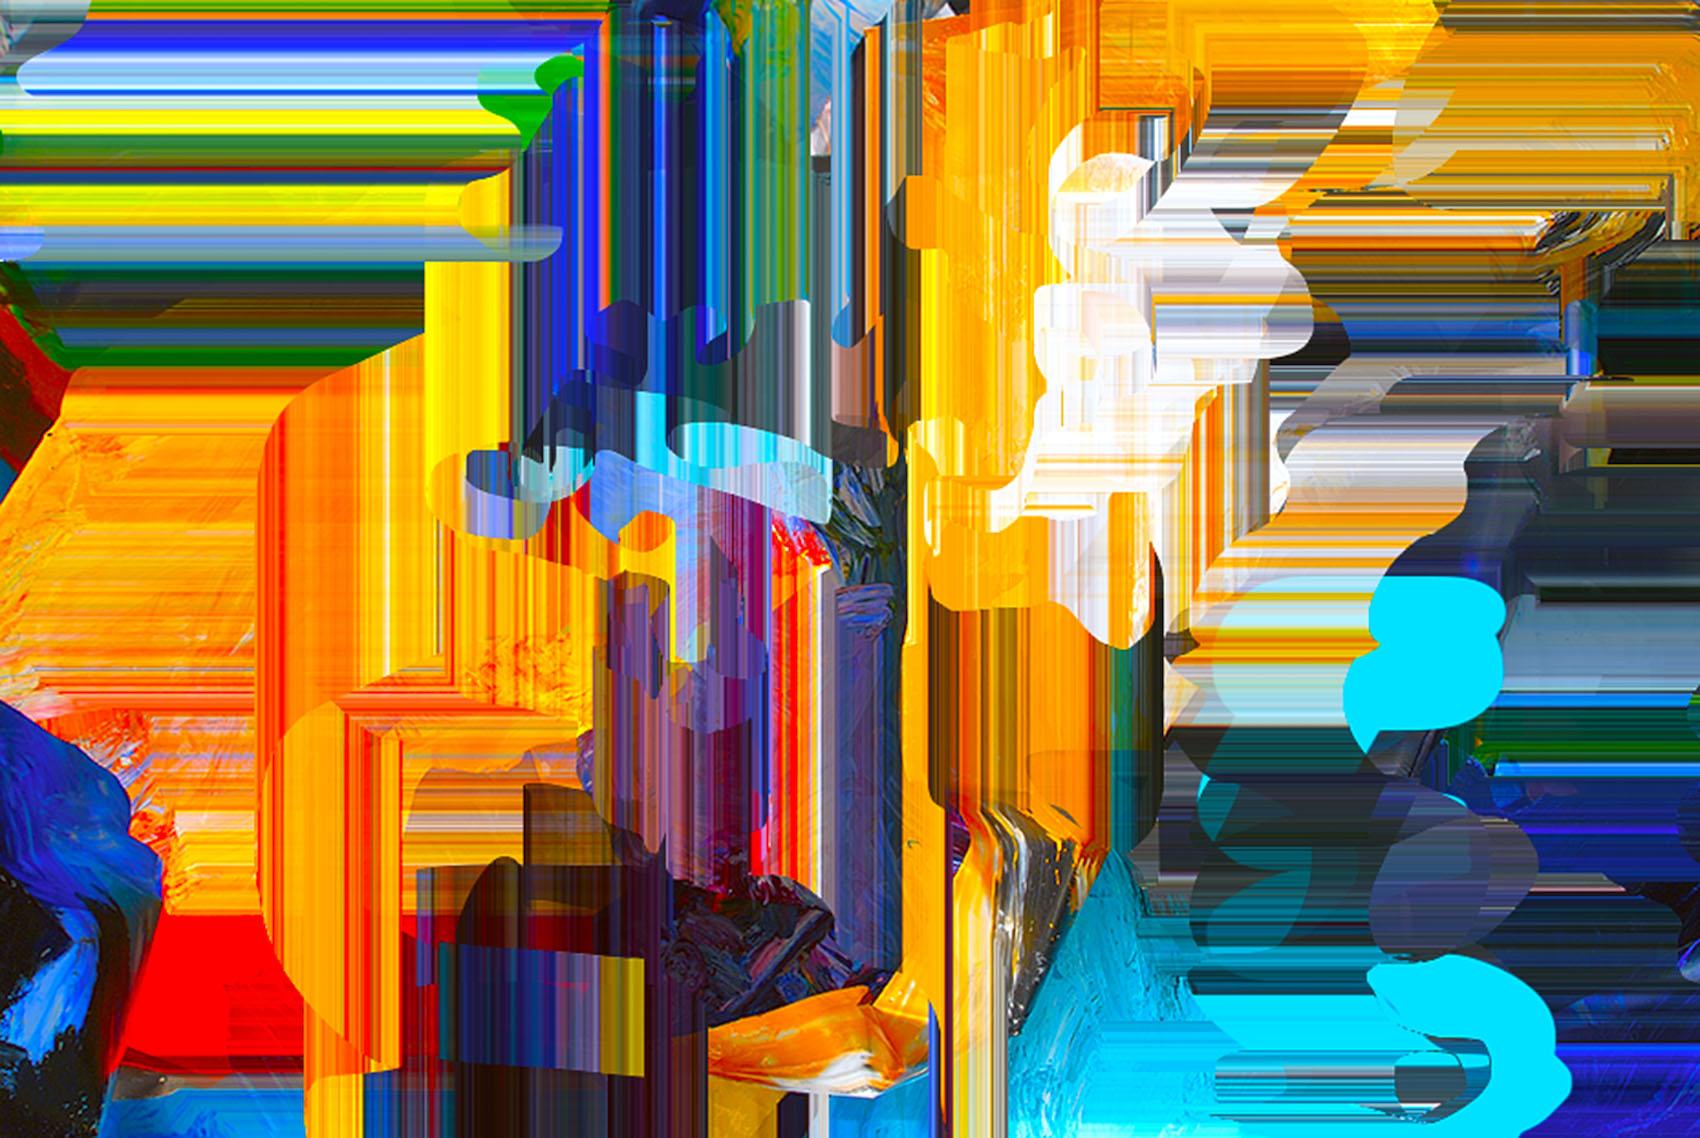 RogelioMaxwell-Finding the Lost Button-2016-ArchivalPigmentPrint-18x24-$1000.jpg